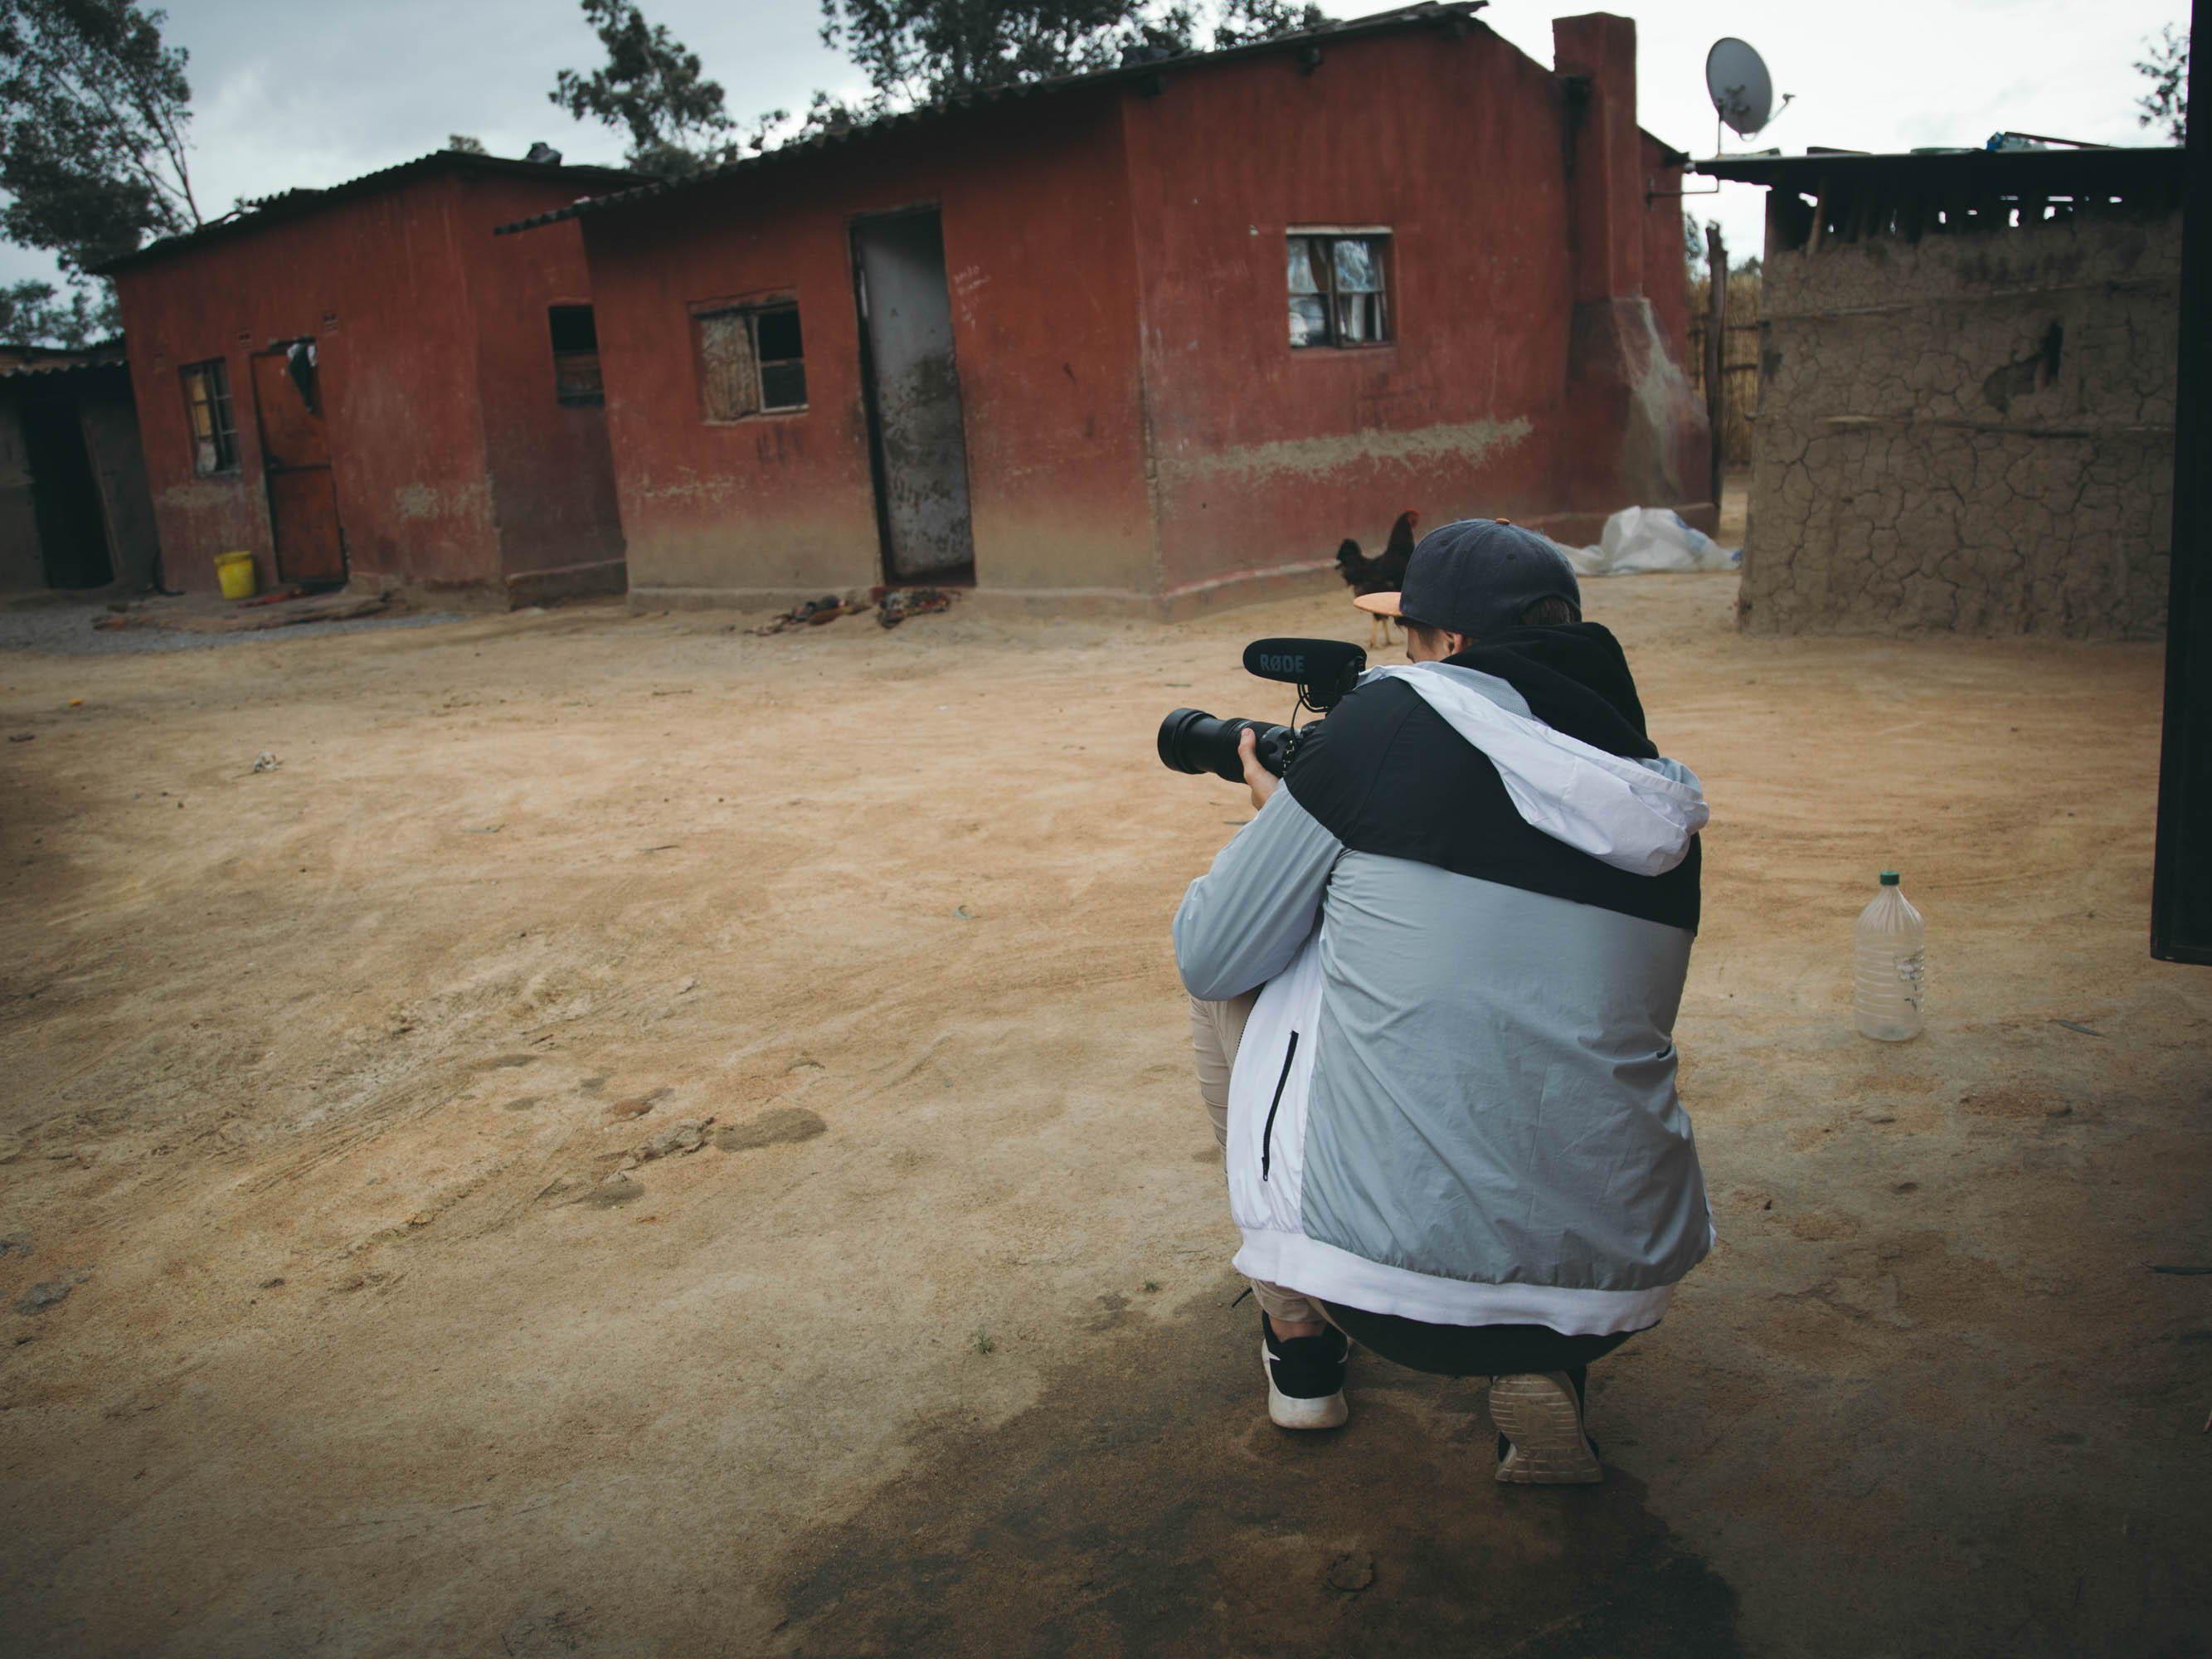 goran jurica filming project kindnes doing our part imire zimbabwe africa virtu virtu bracelets growvirtu grow to inspire